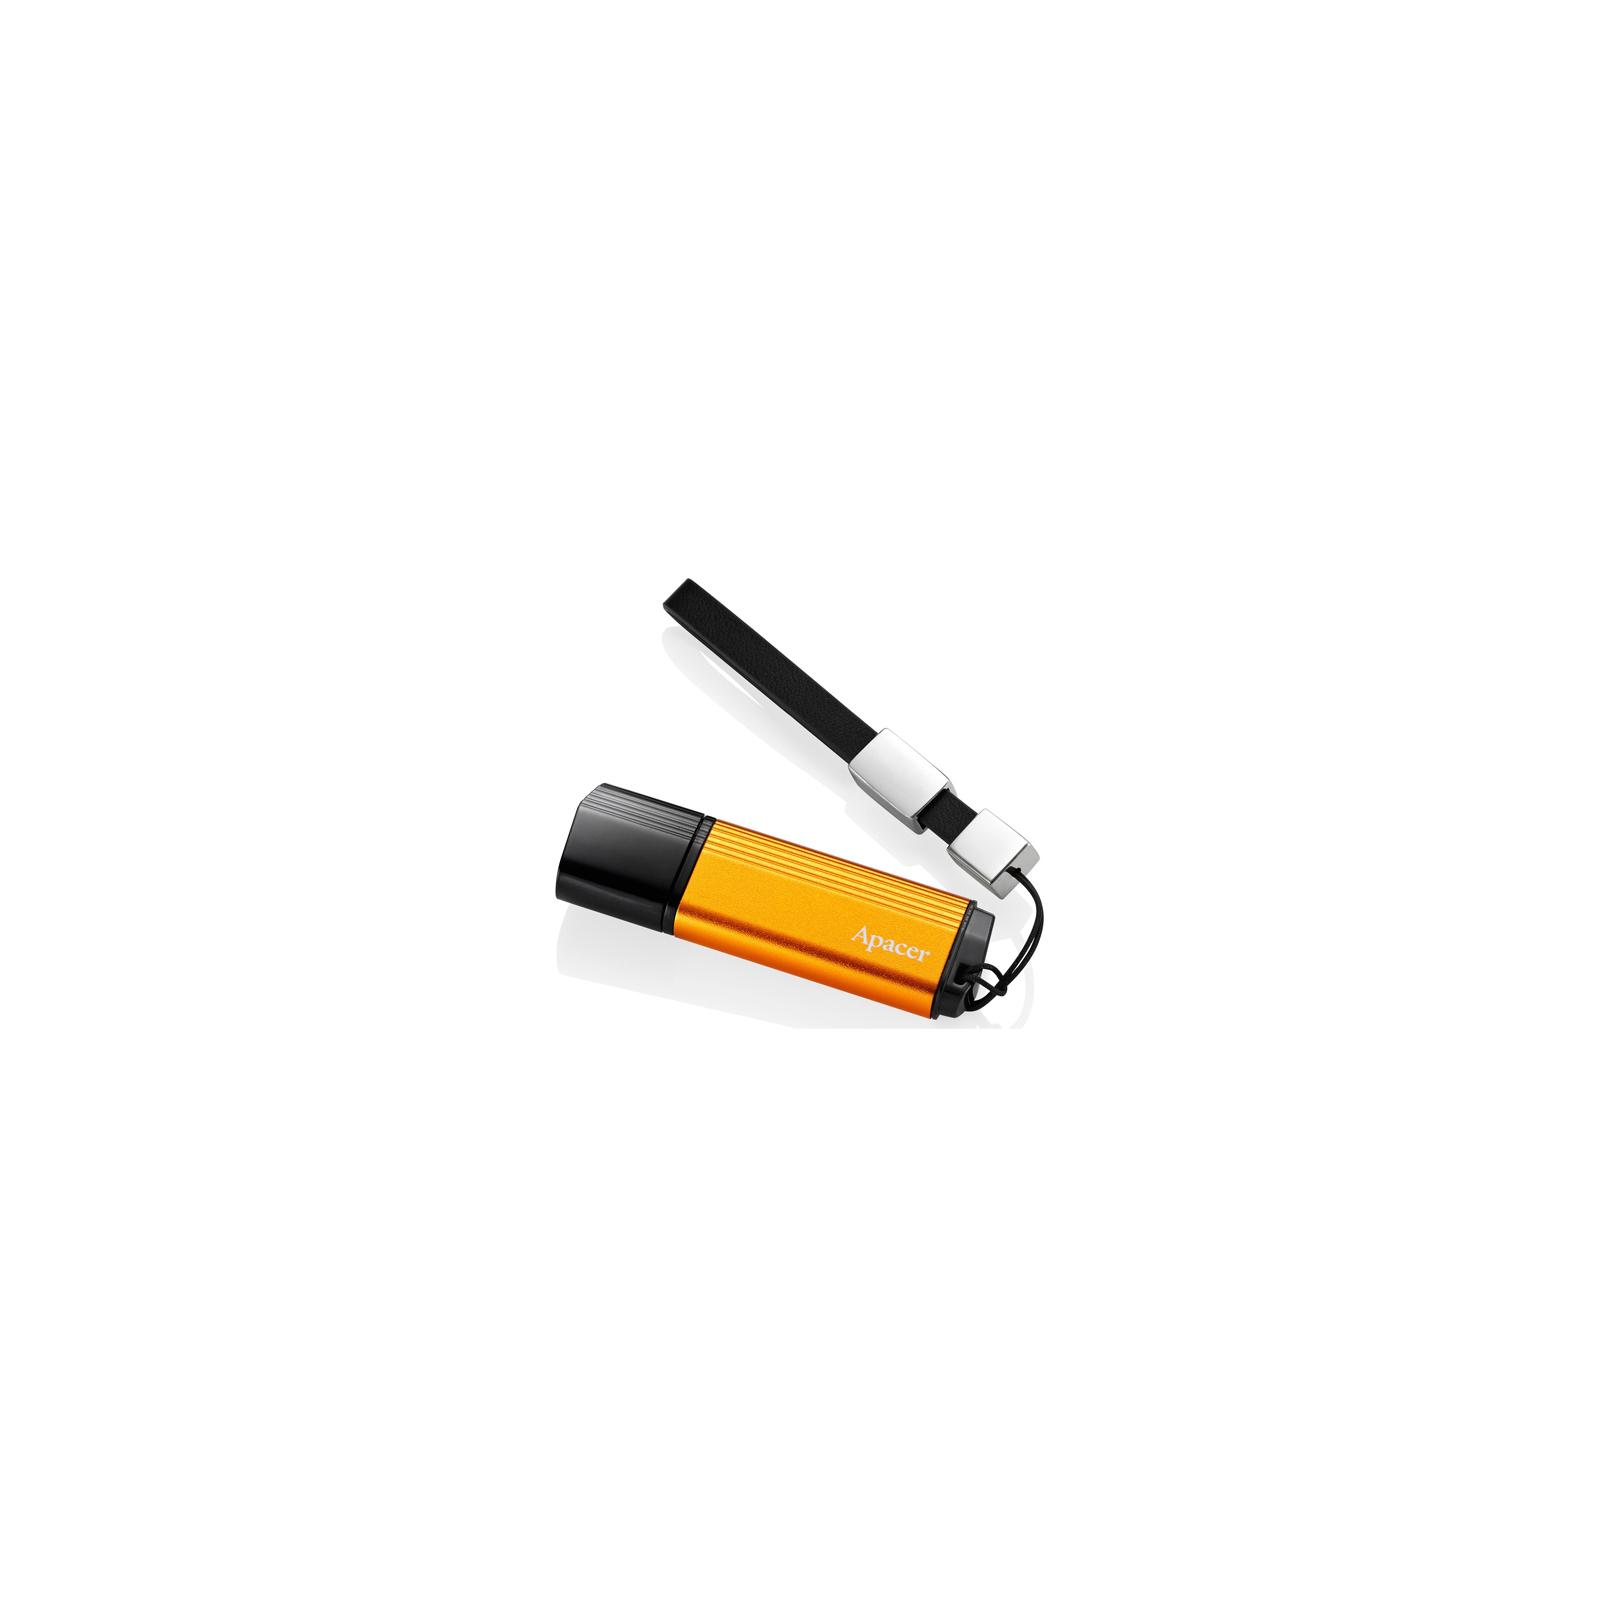 USB флеш накопитель 16GB AH330 Fiery orange RP USB2.0 Apacer (AP16GAH330T-1) изображение 3